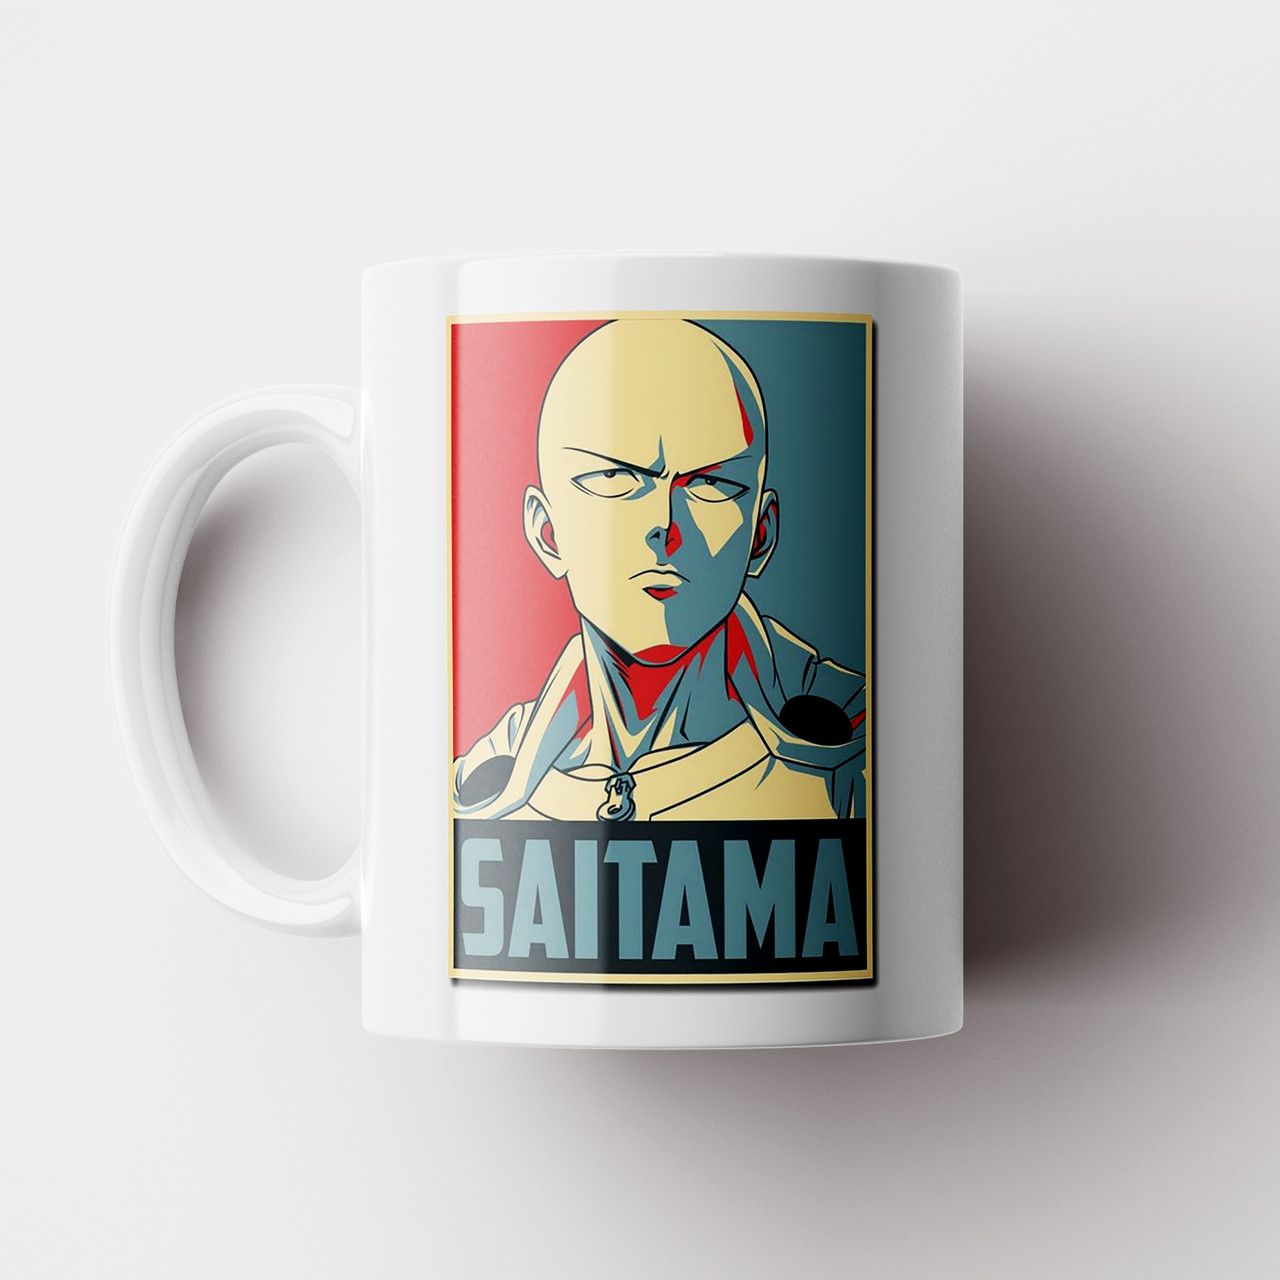 Чашка Сайтама Ван Панч Мен. Аніме. Saitama One Punch Man Чашка з фото